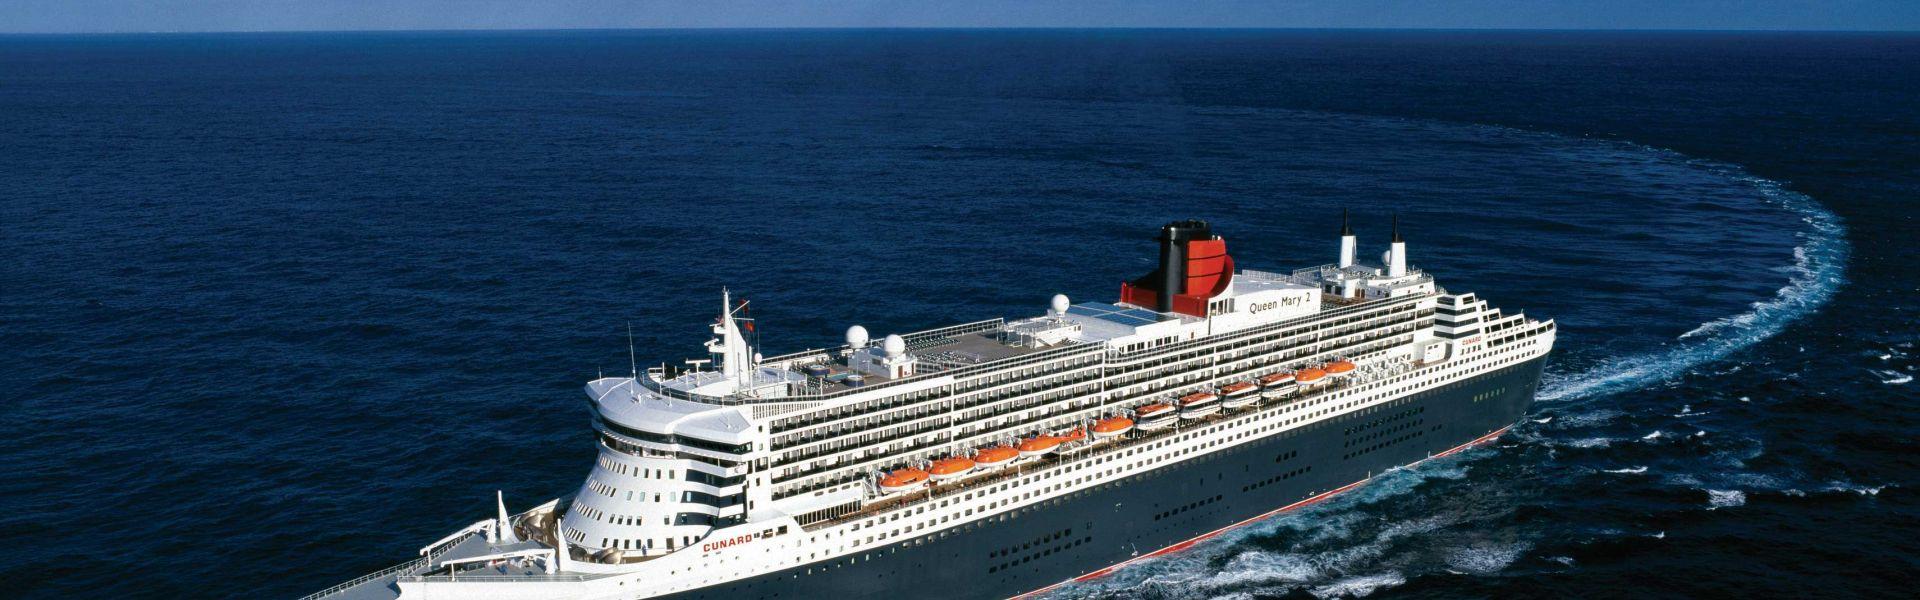 Croaziera 2019 - Asia de Sud Est (Hong Kong) - Cunard Line - Queen Mary 2 - 20 nopti